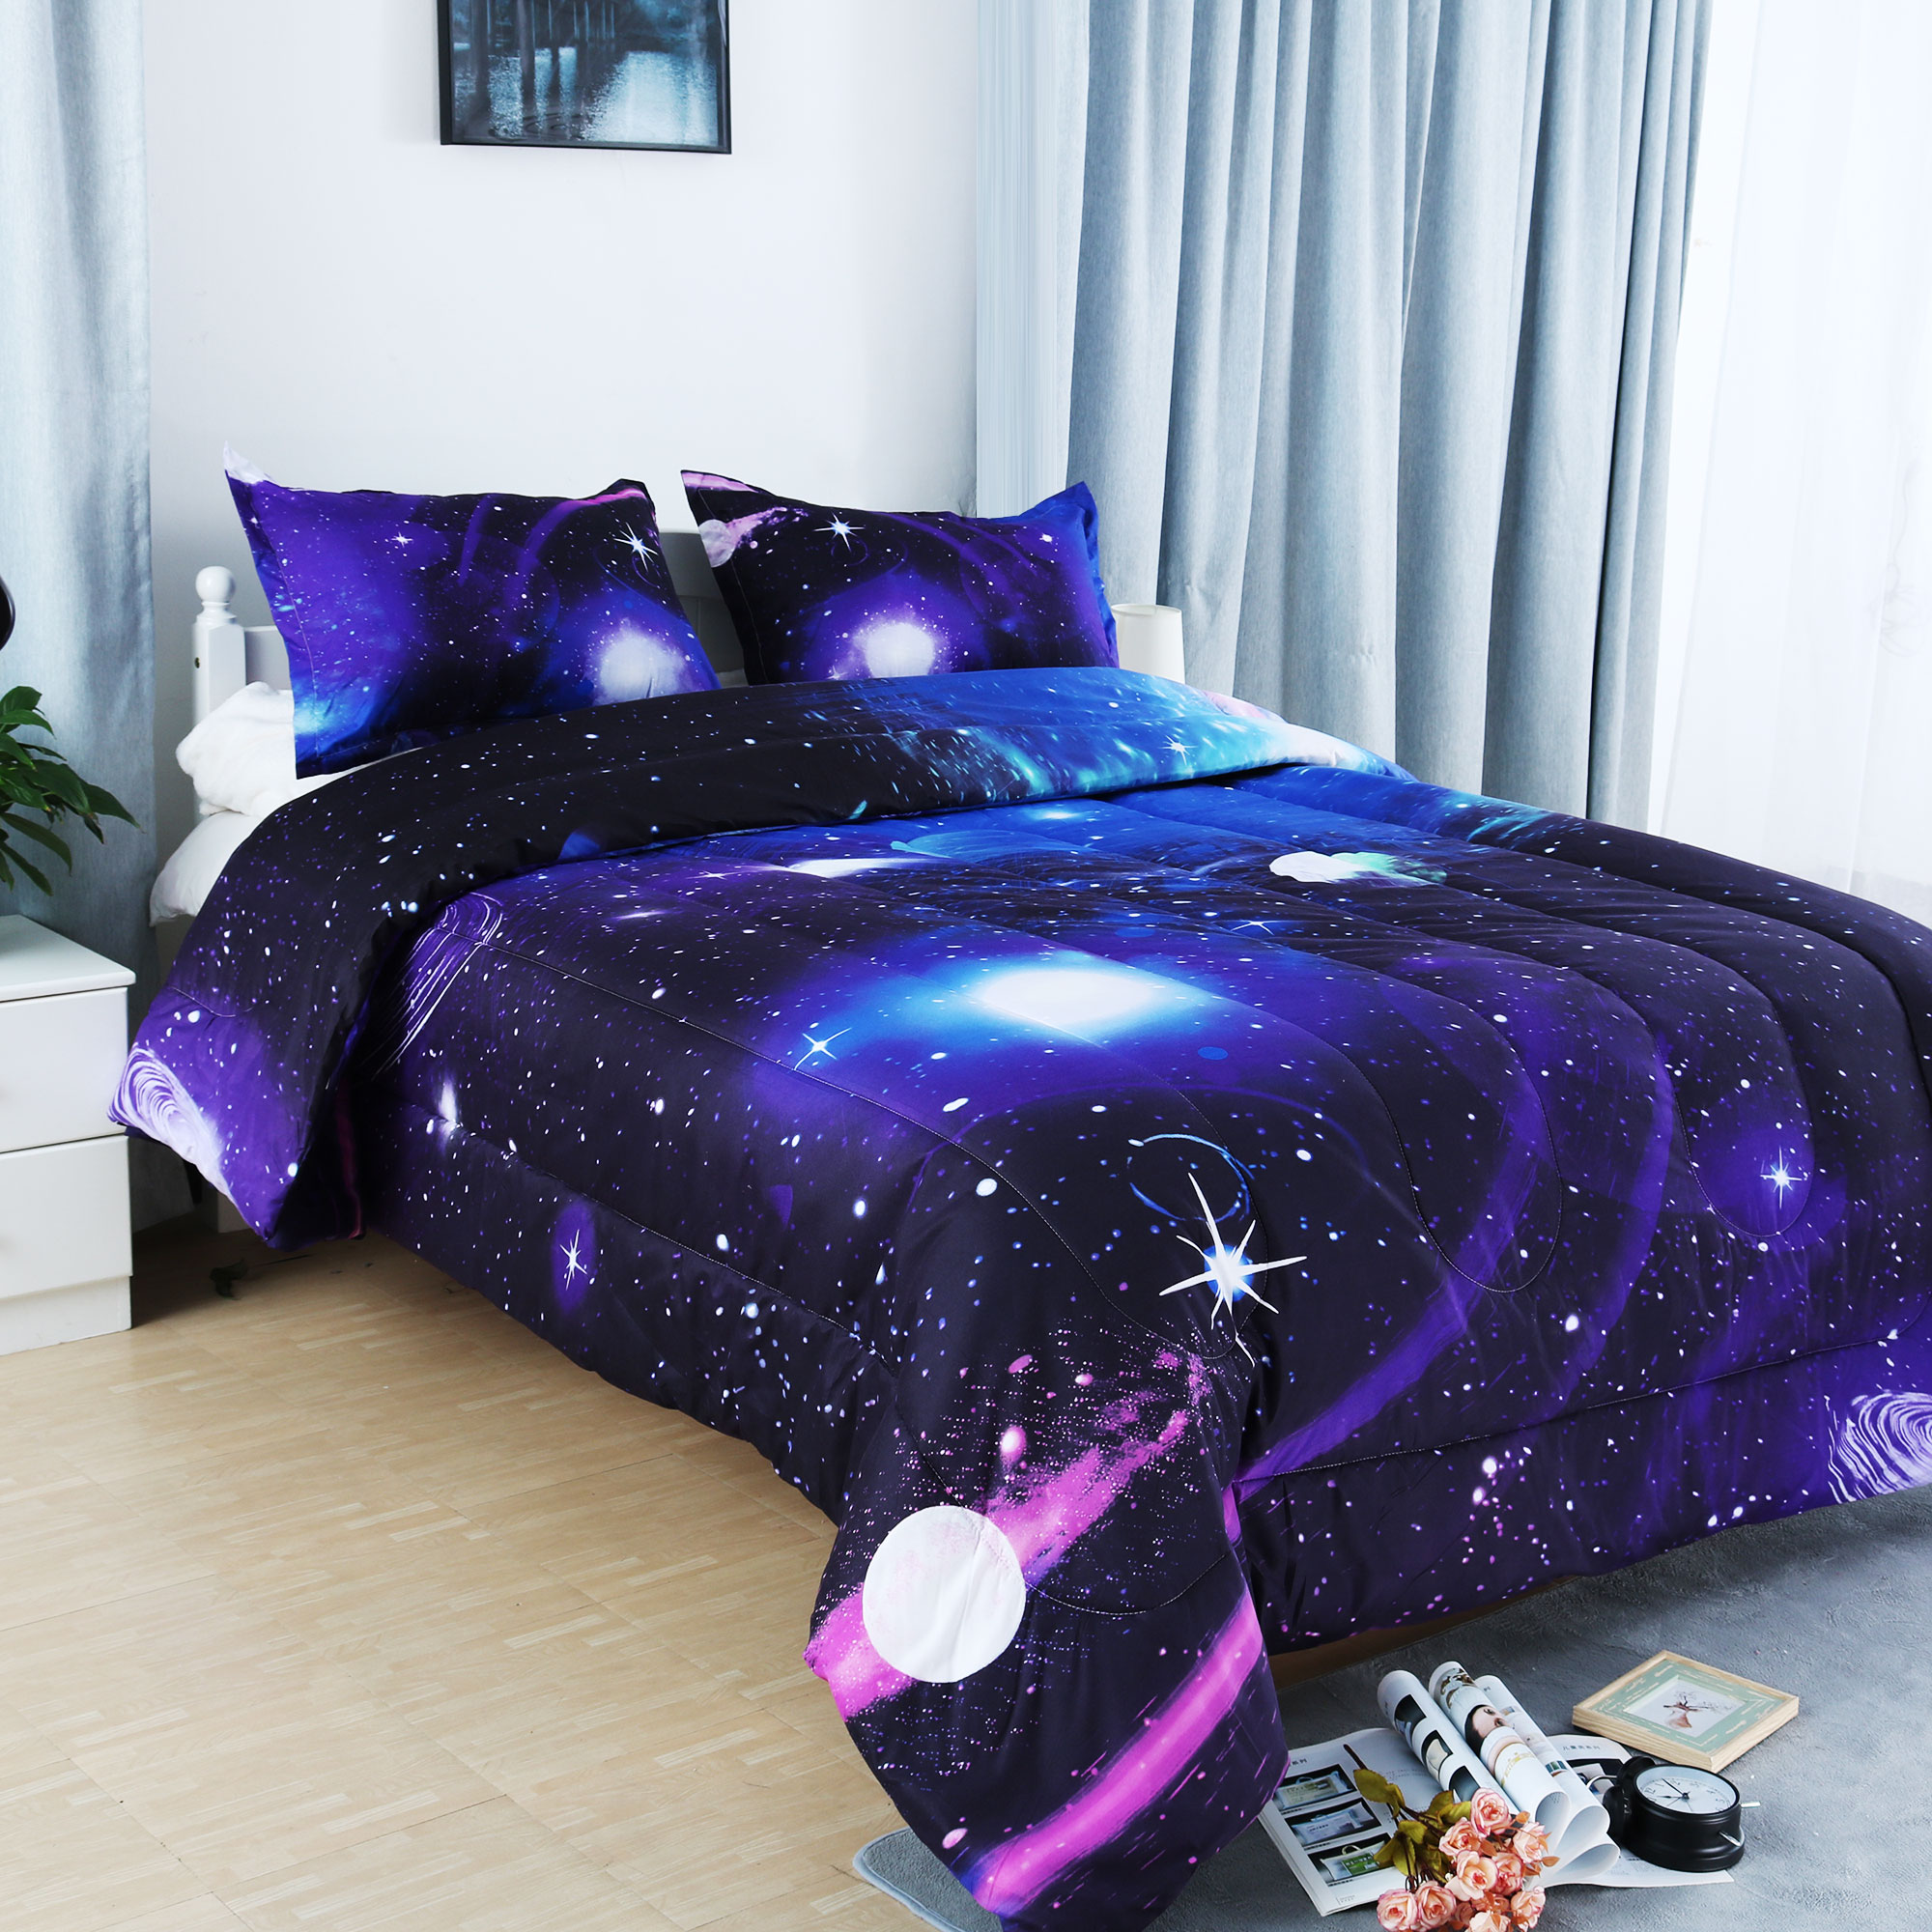 Full/Queen 3pcs Galaxies Purple Comforter Set All-season Down Quilted Duvet